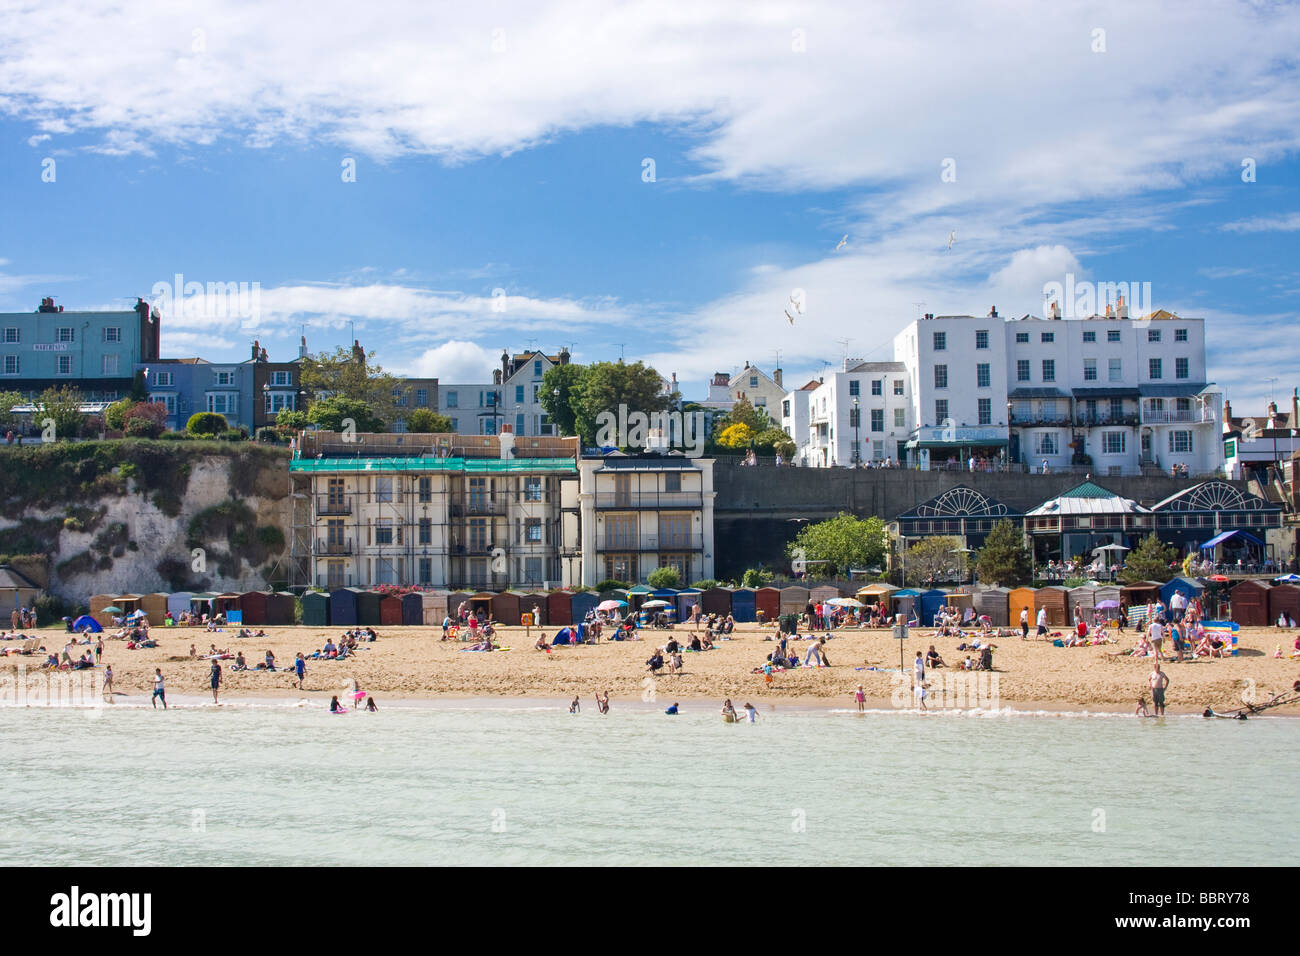 Broadstairs Beach, Viking Bay, Kent, England - Stock Image